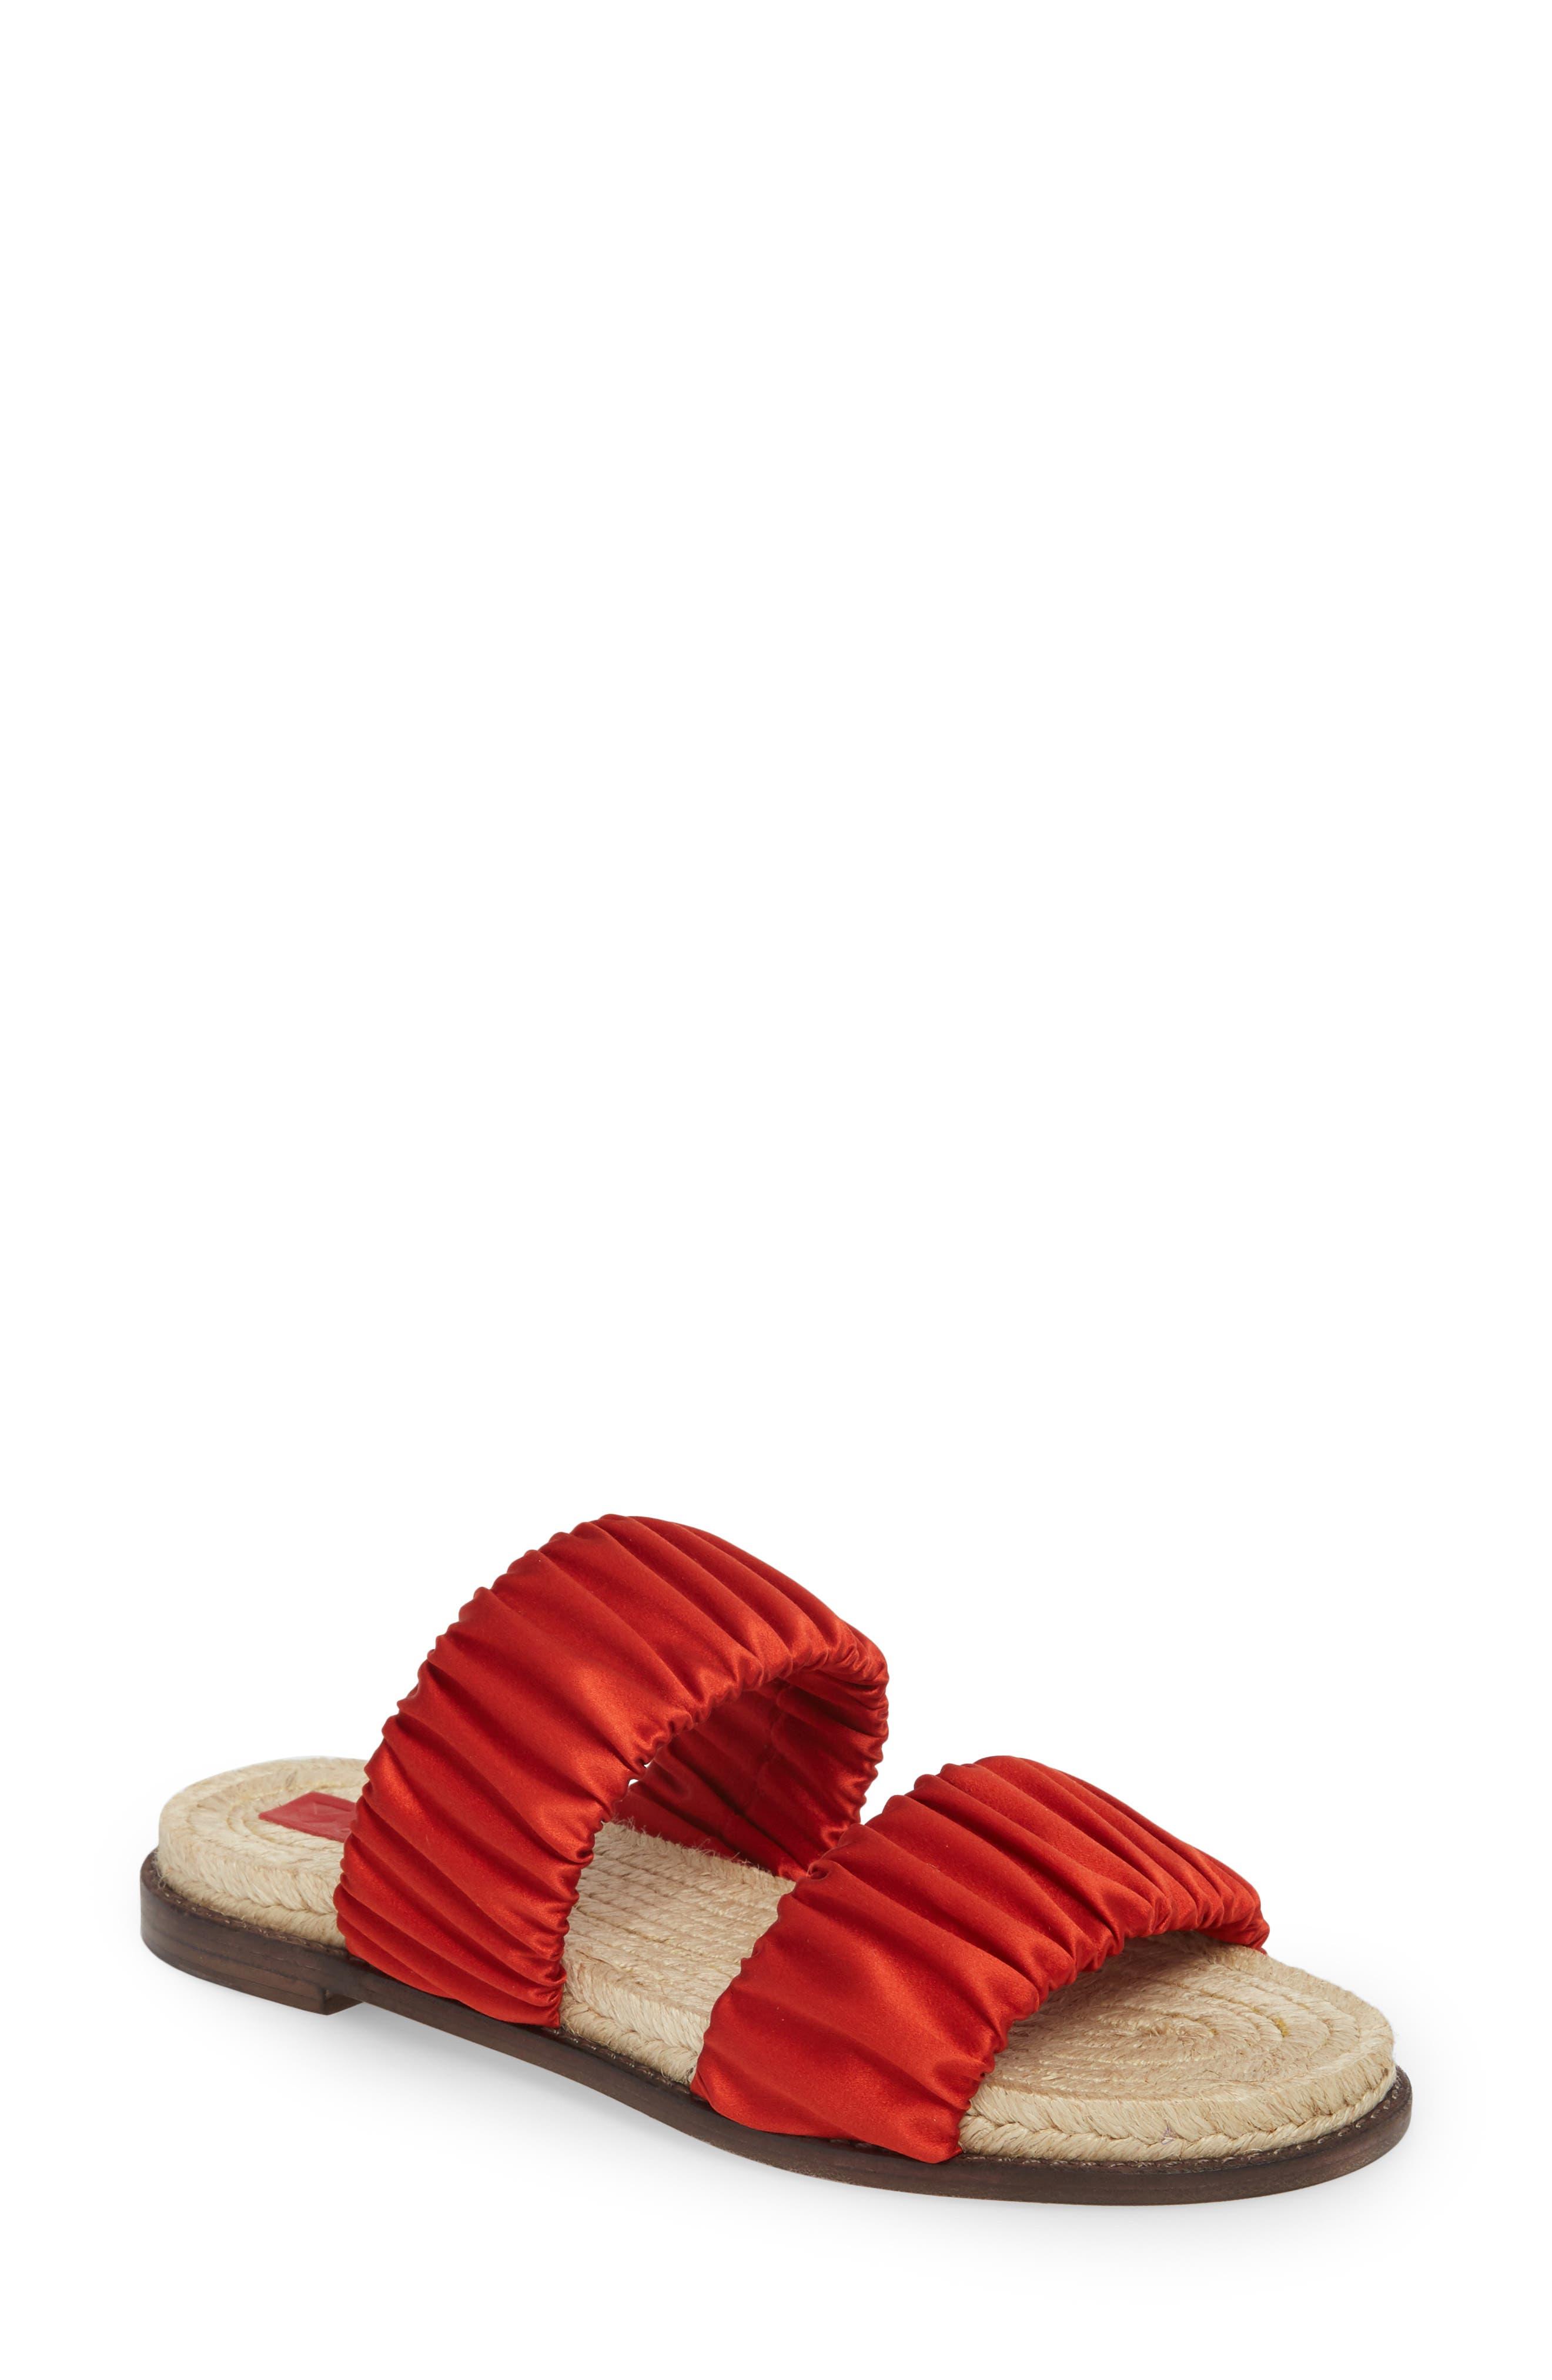 Espadrille Sandal,                             Main thumbnail 1, color,                             Red Tulip